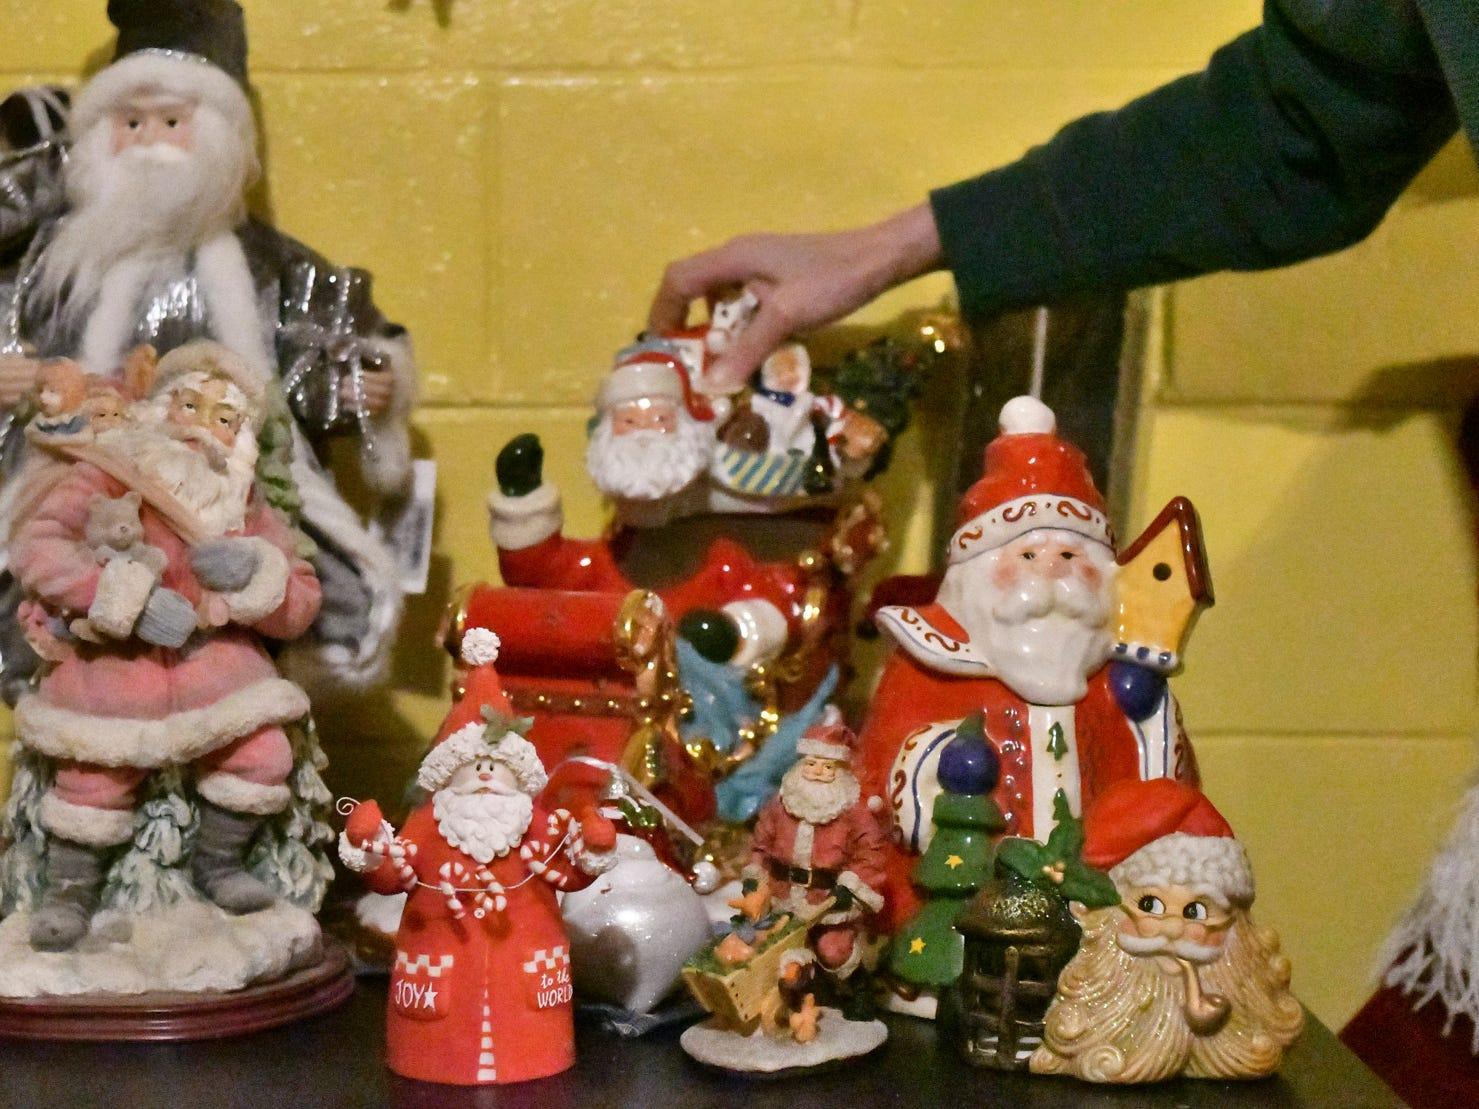 Some of the Santas in Lansing resident Lisa Coffman's collection of 2,000 plus Santa Claus'.